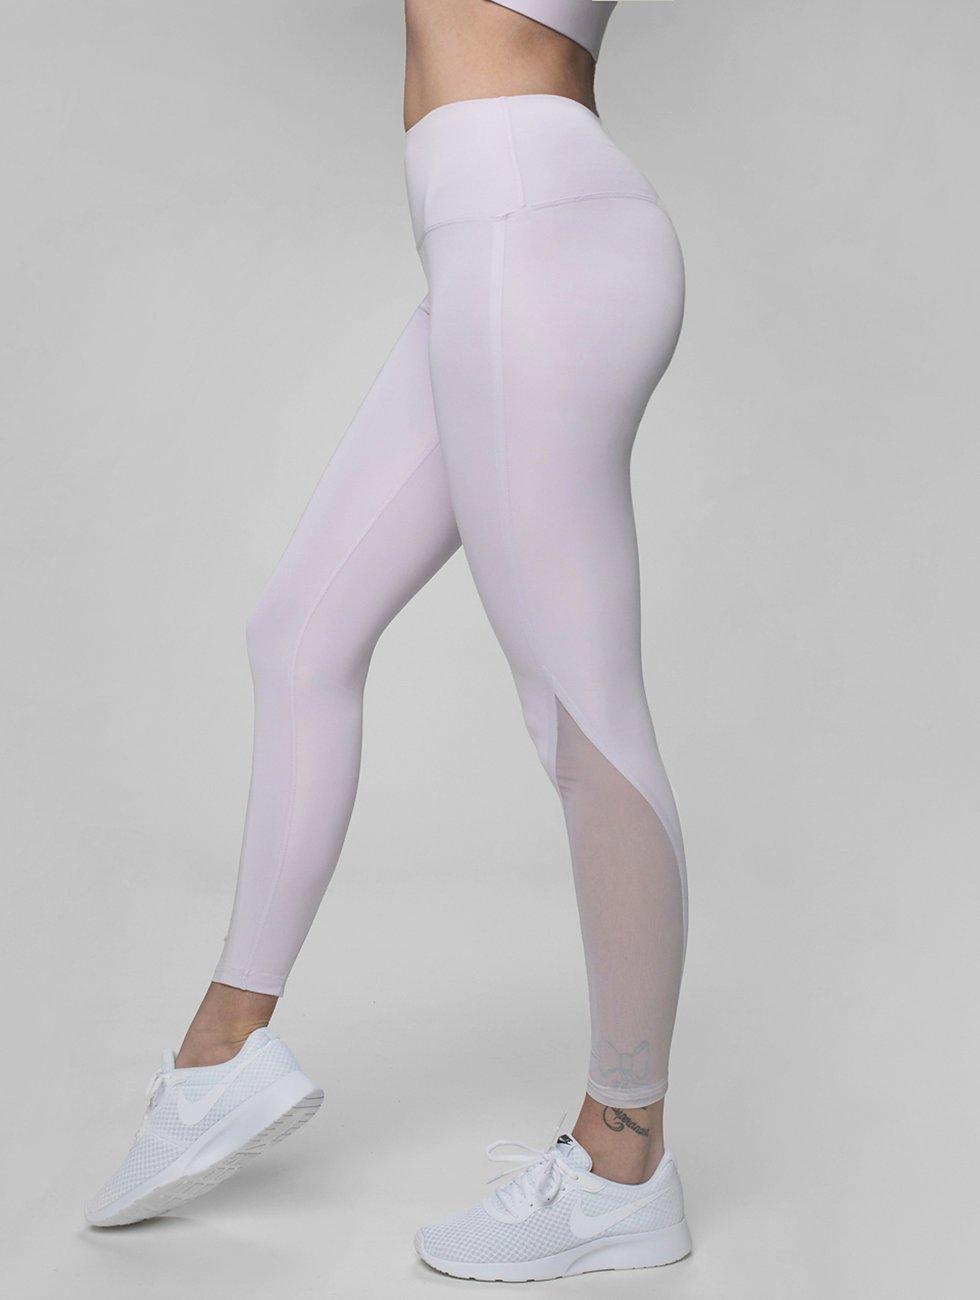 Beyond Limits Legging Highlight paars